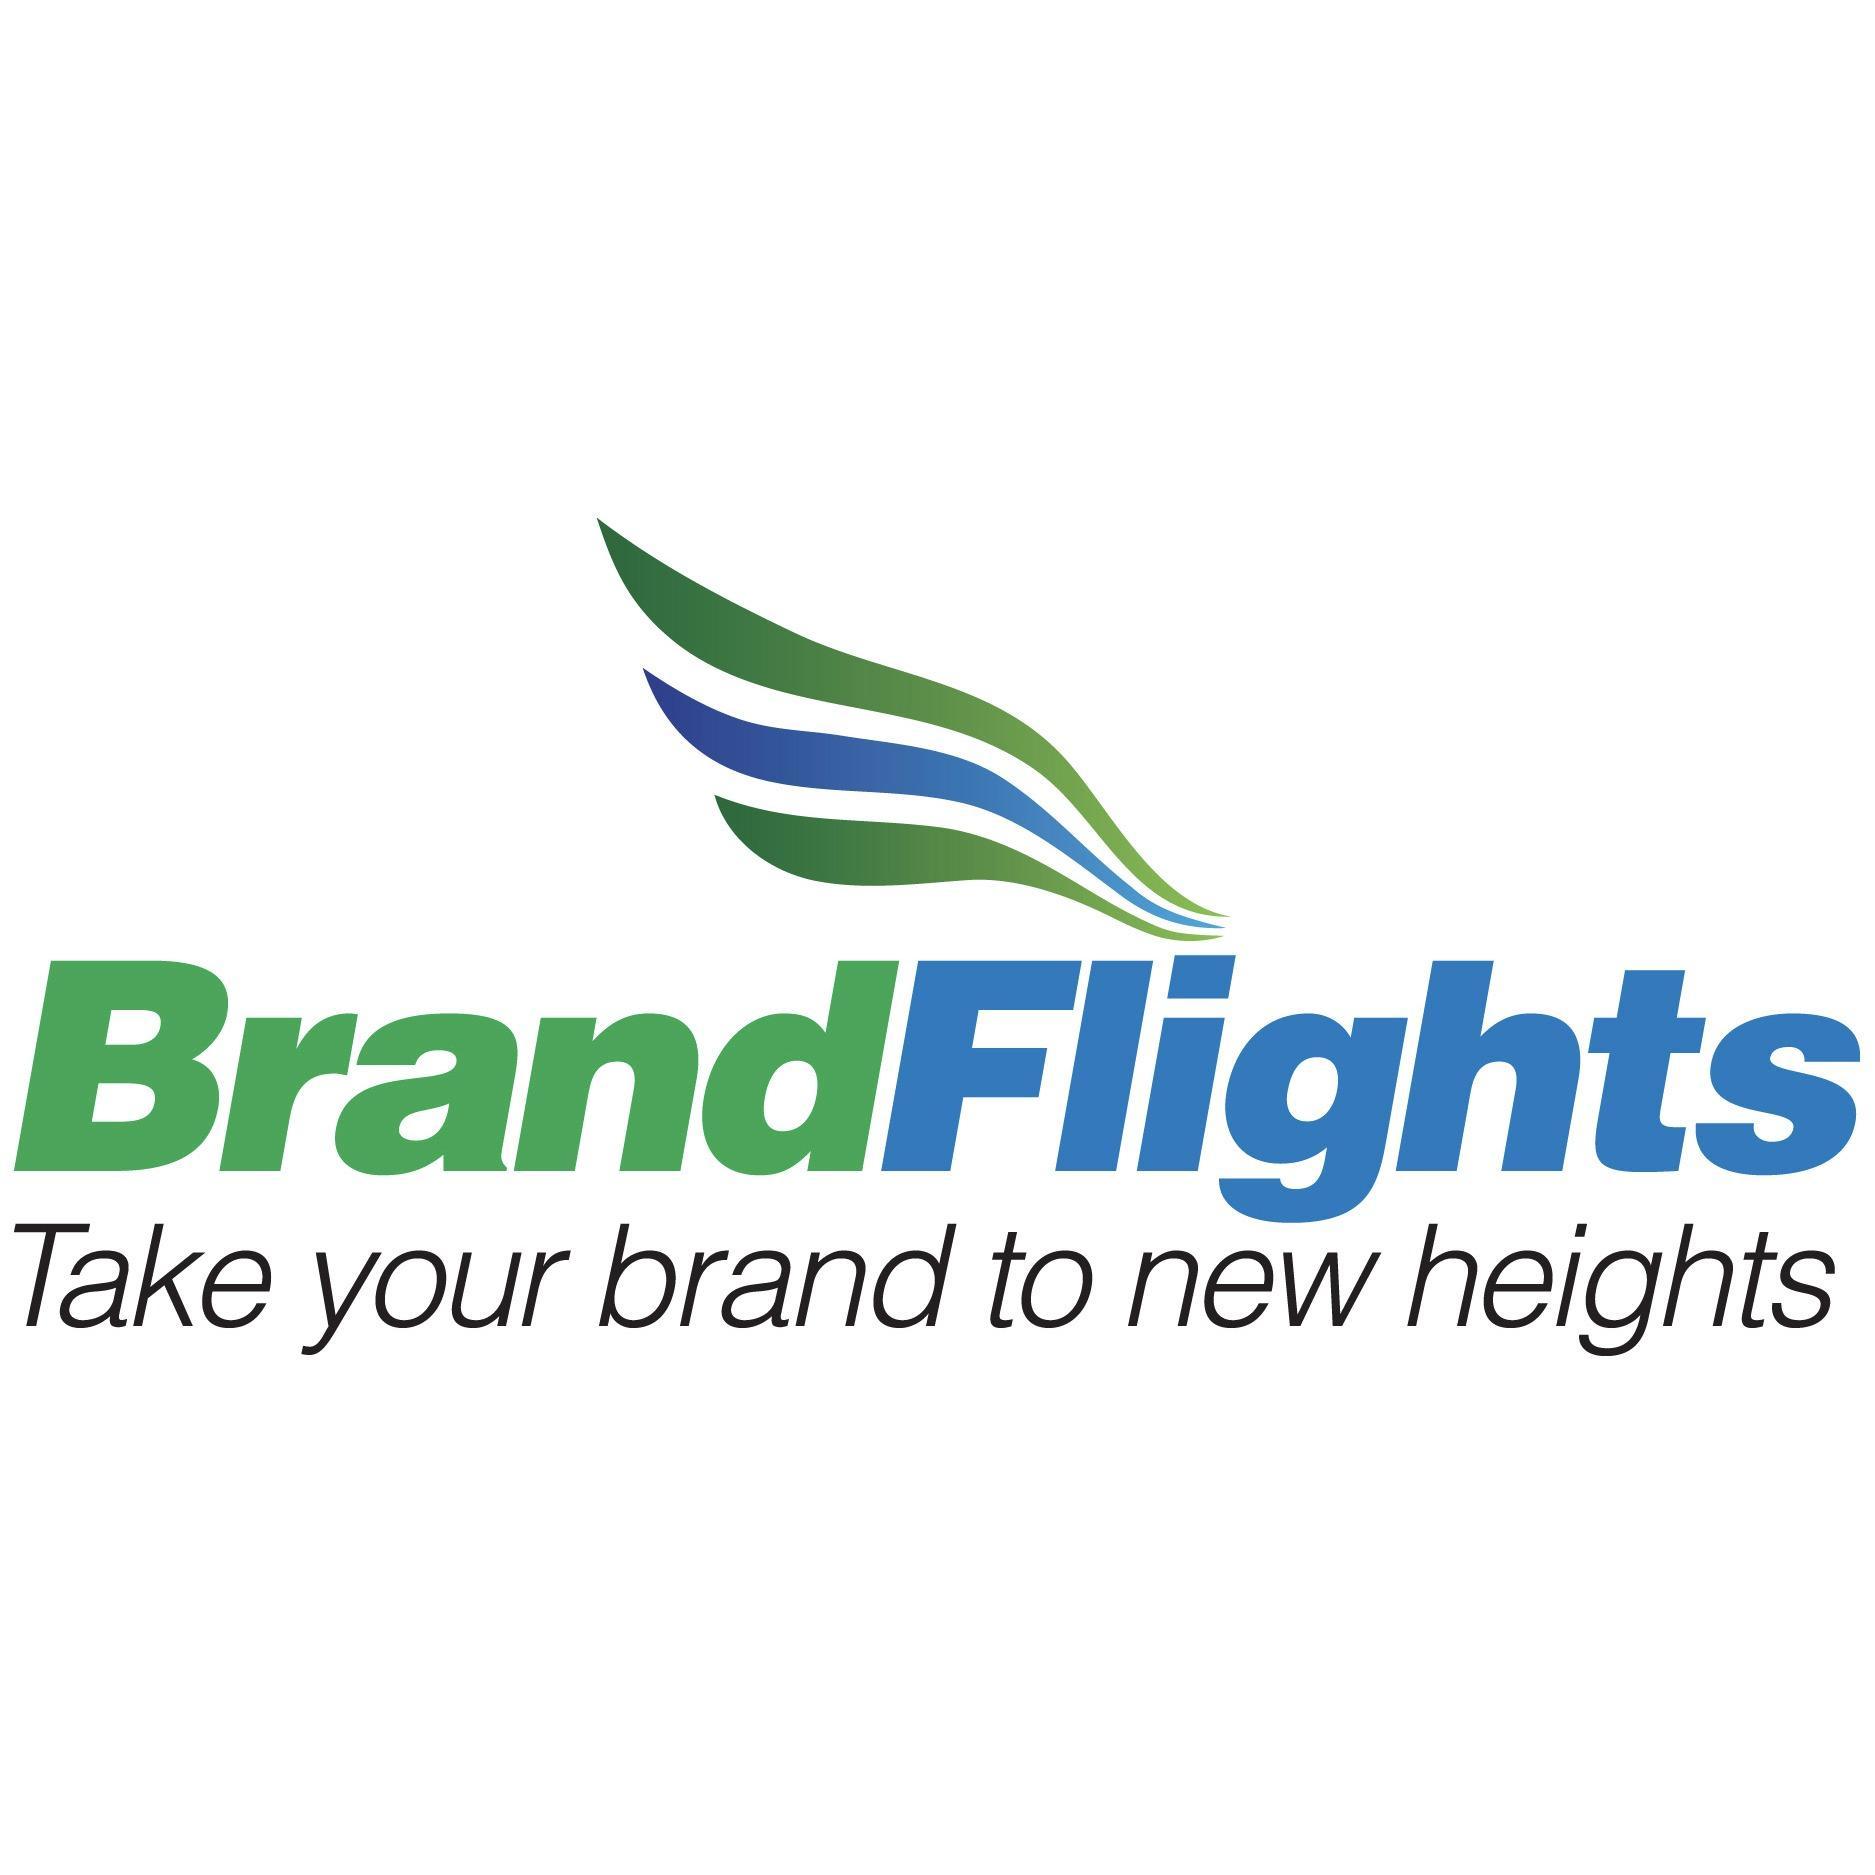 Brand Flights